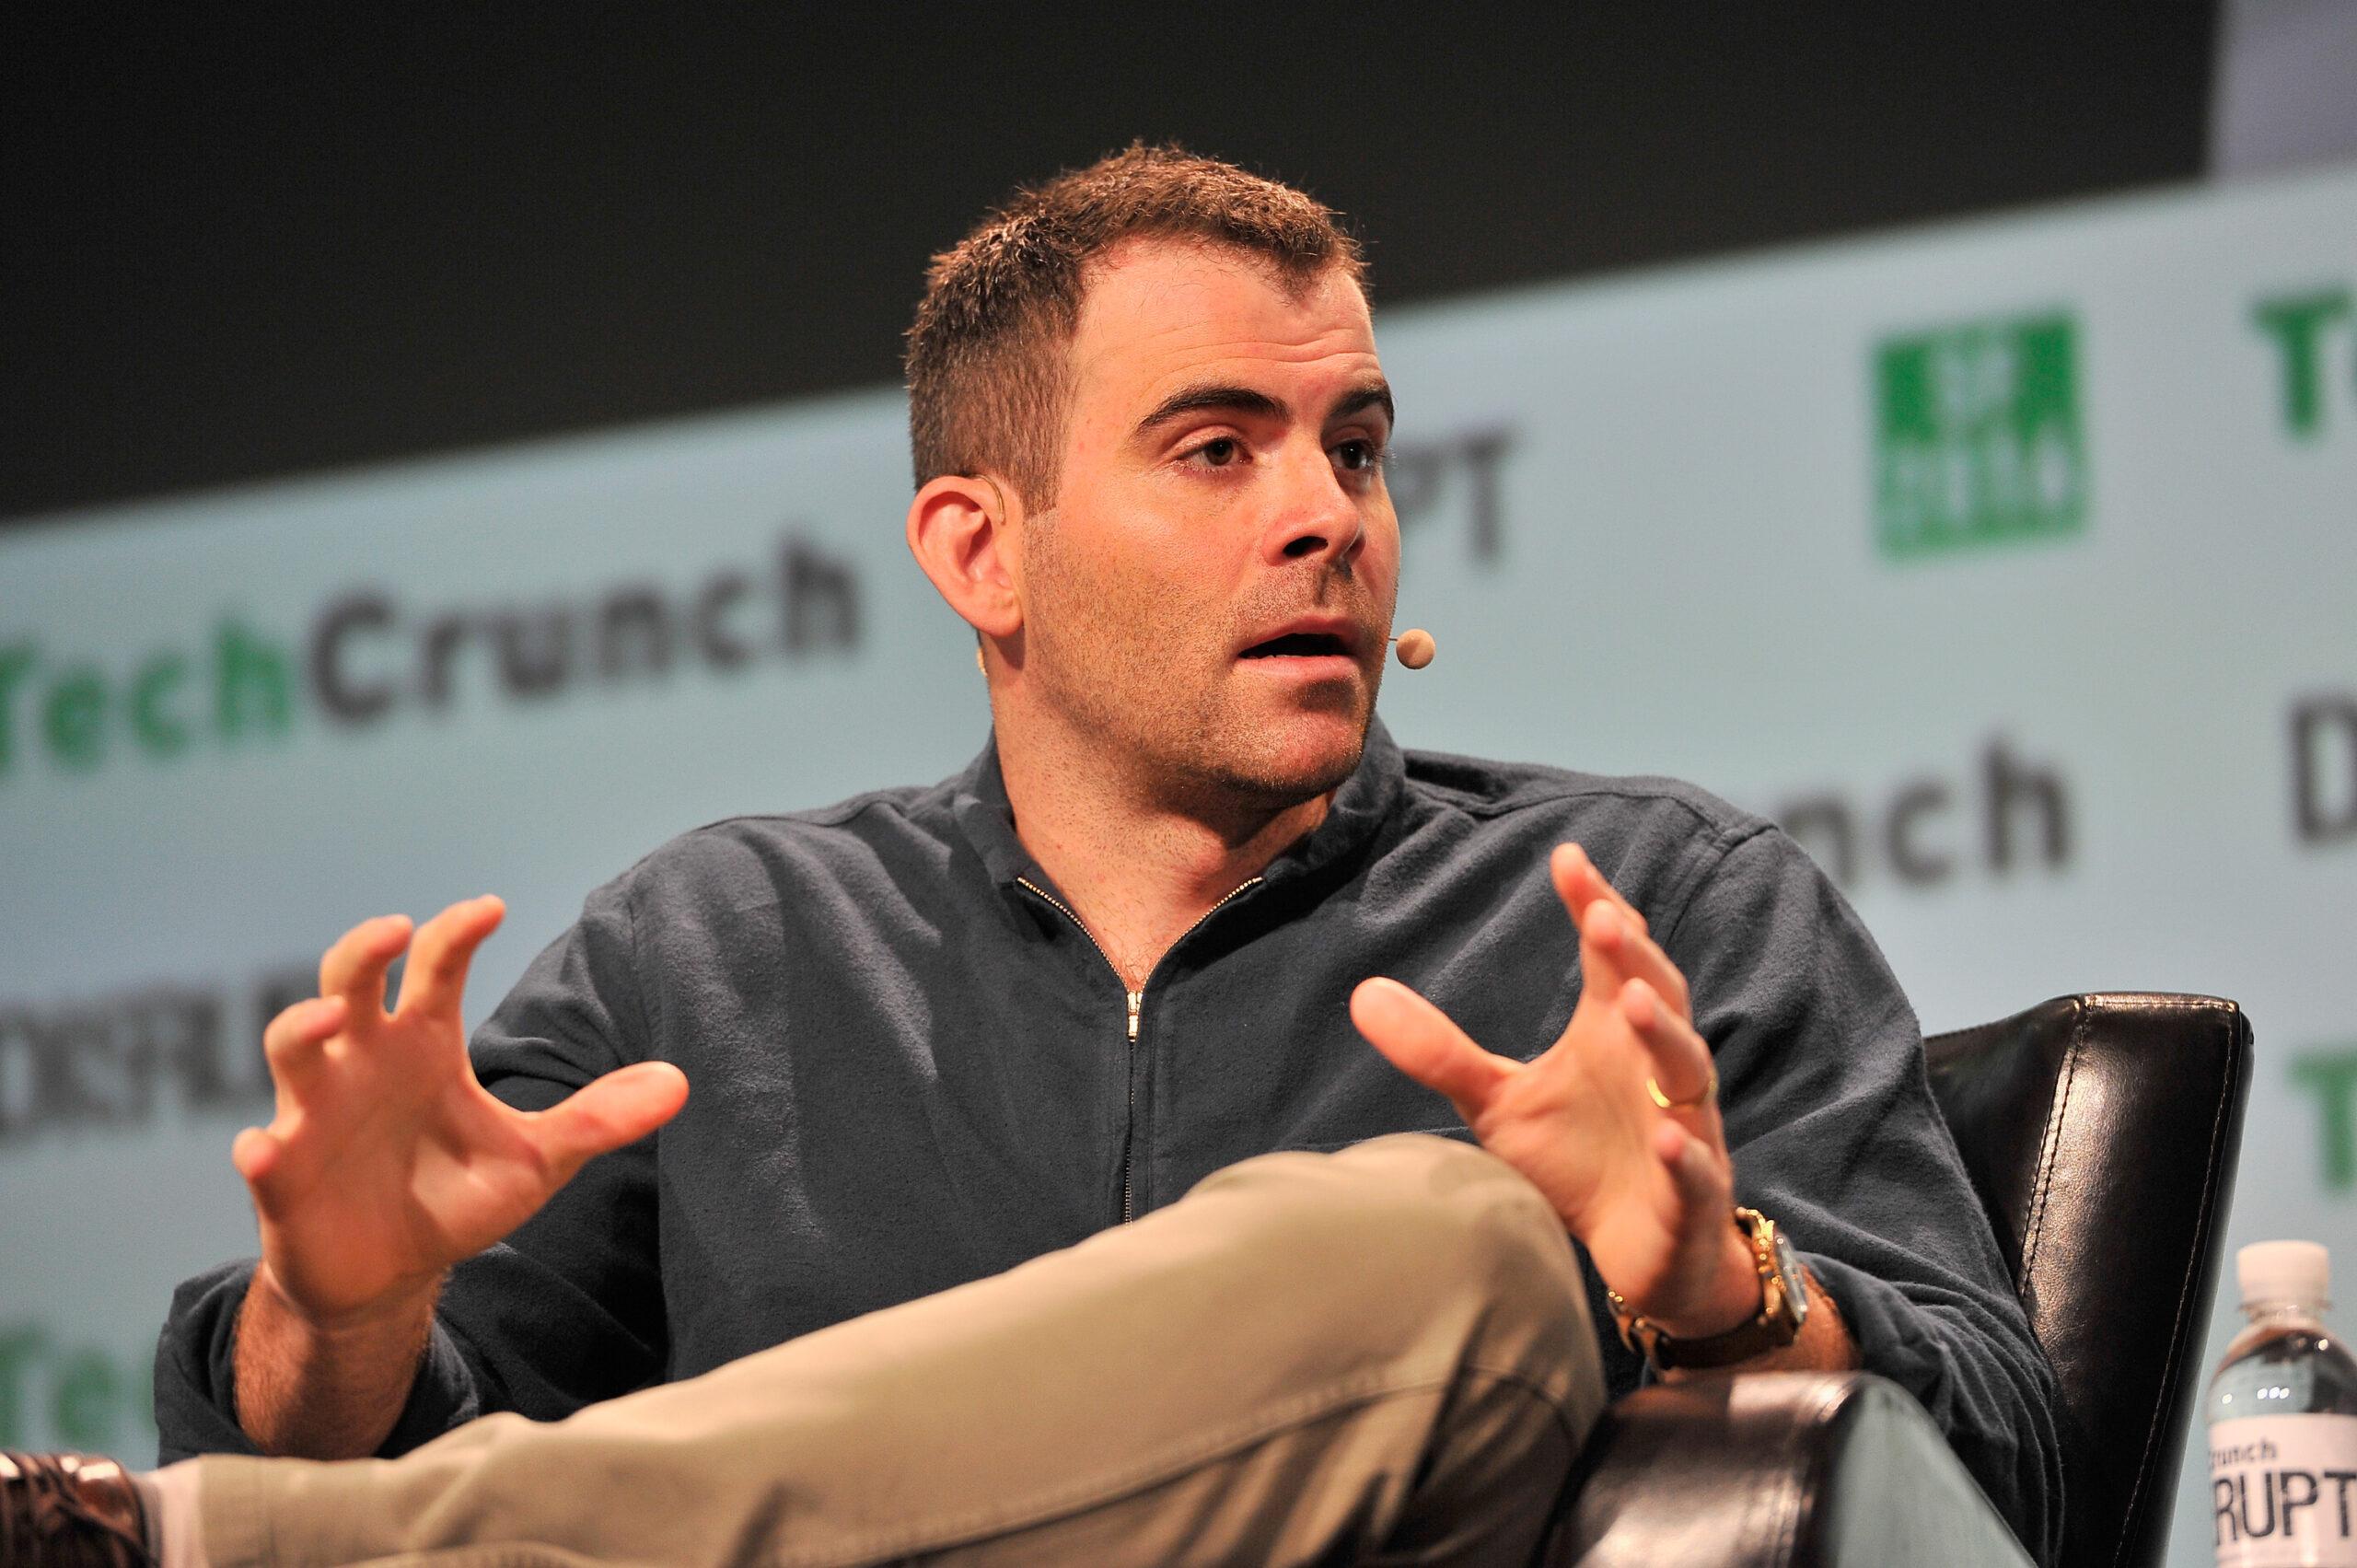 Head Of Instagram Adam Mosseri Speaking At Conference